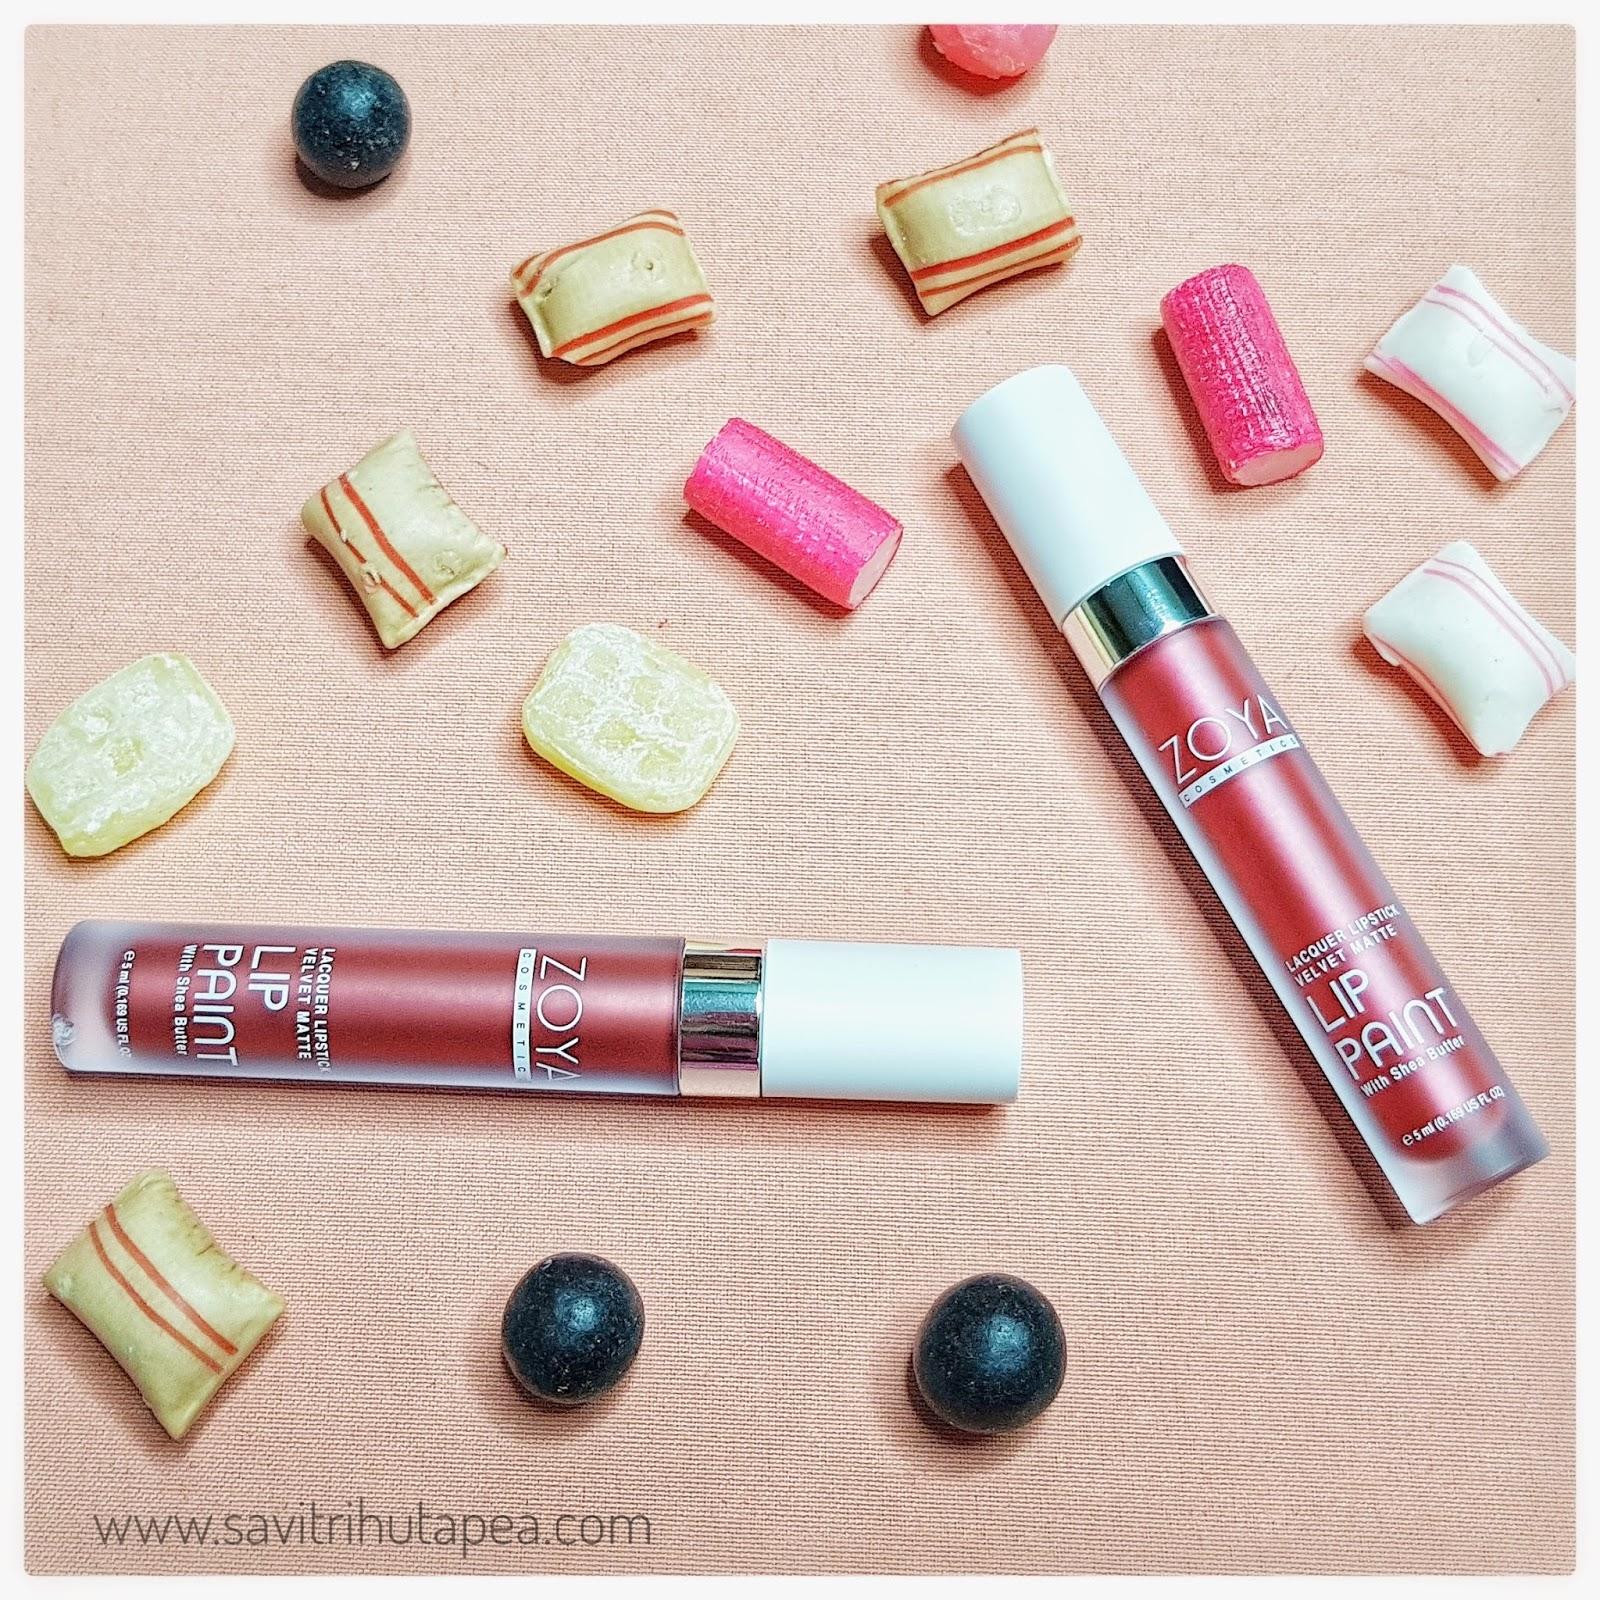 Sponsored Review Swatch Zoya Metallic Lip Paint Shade Elizabeth And Beatrix